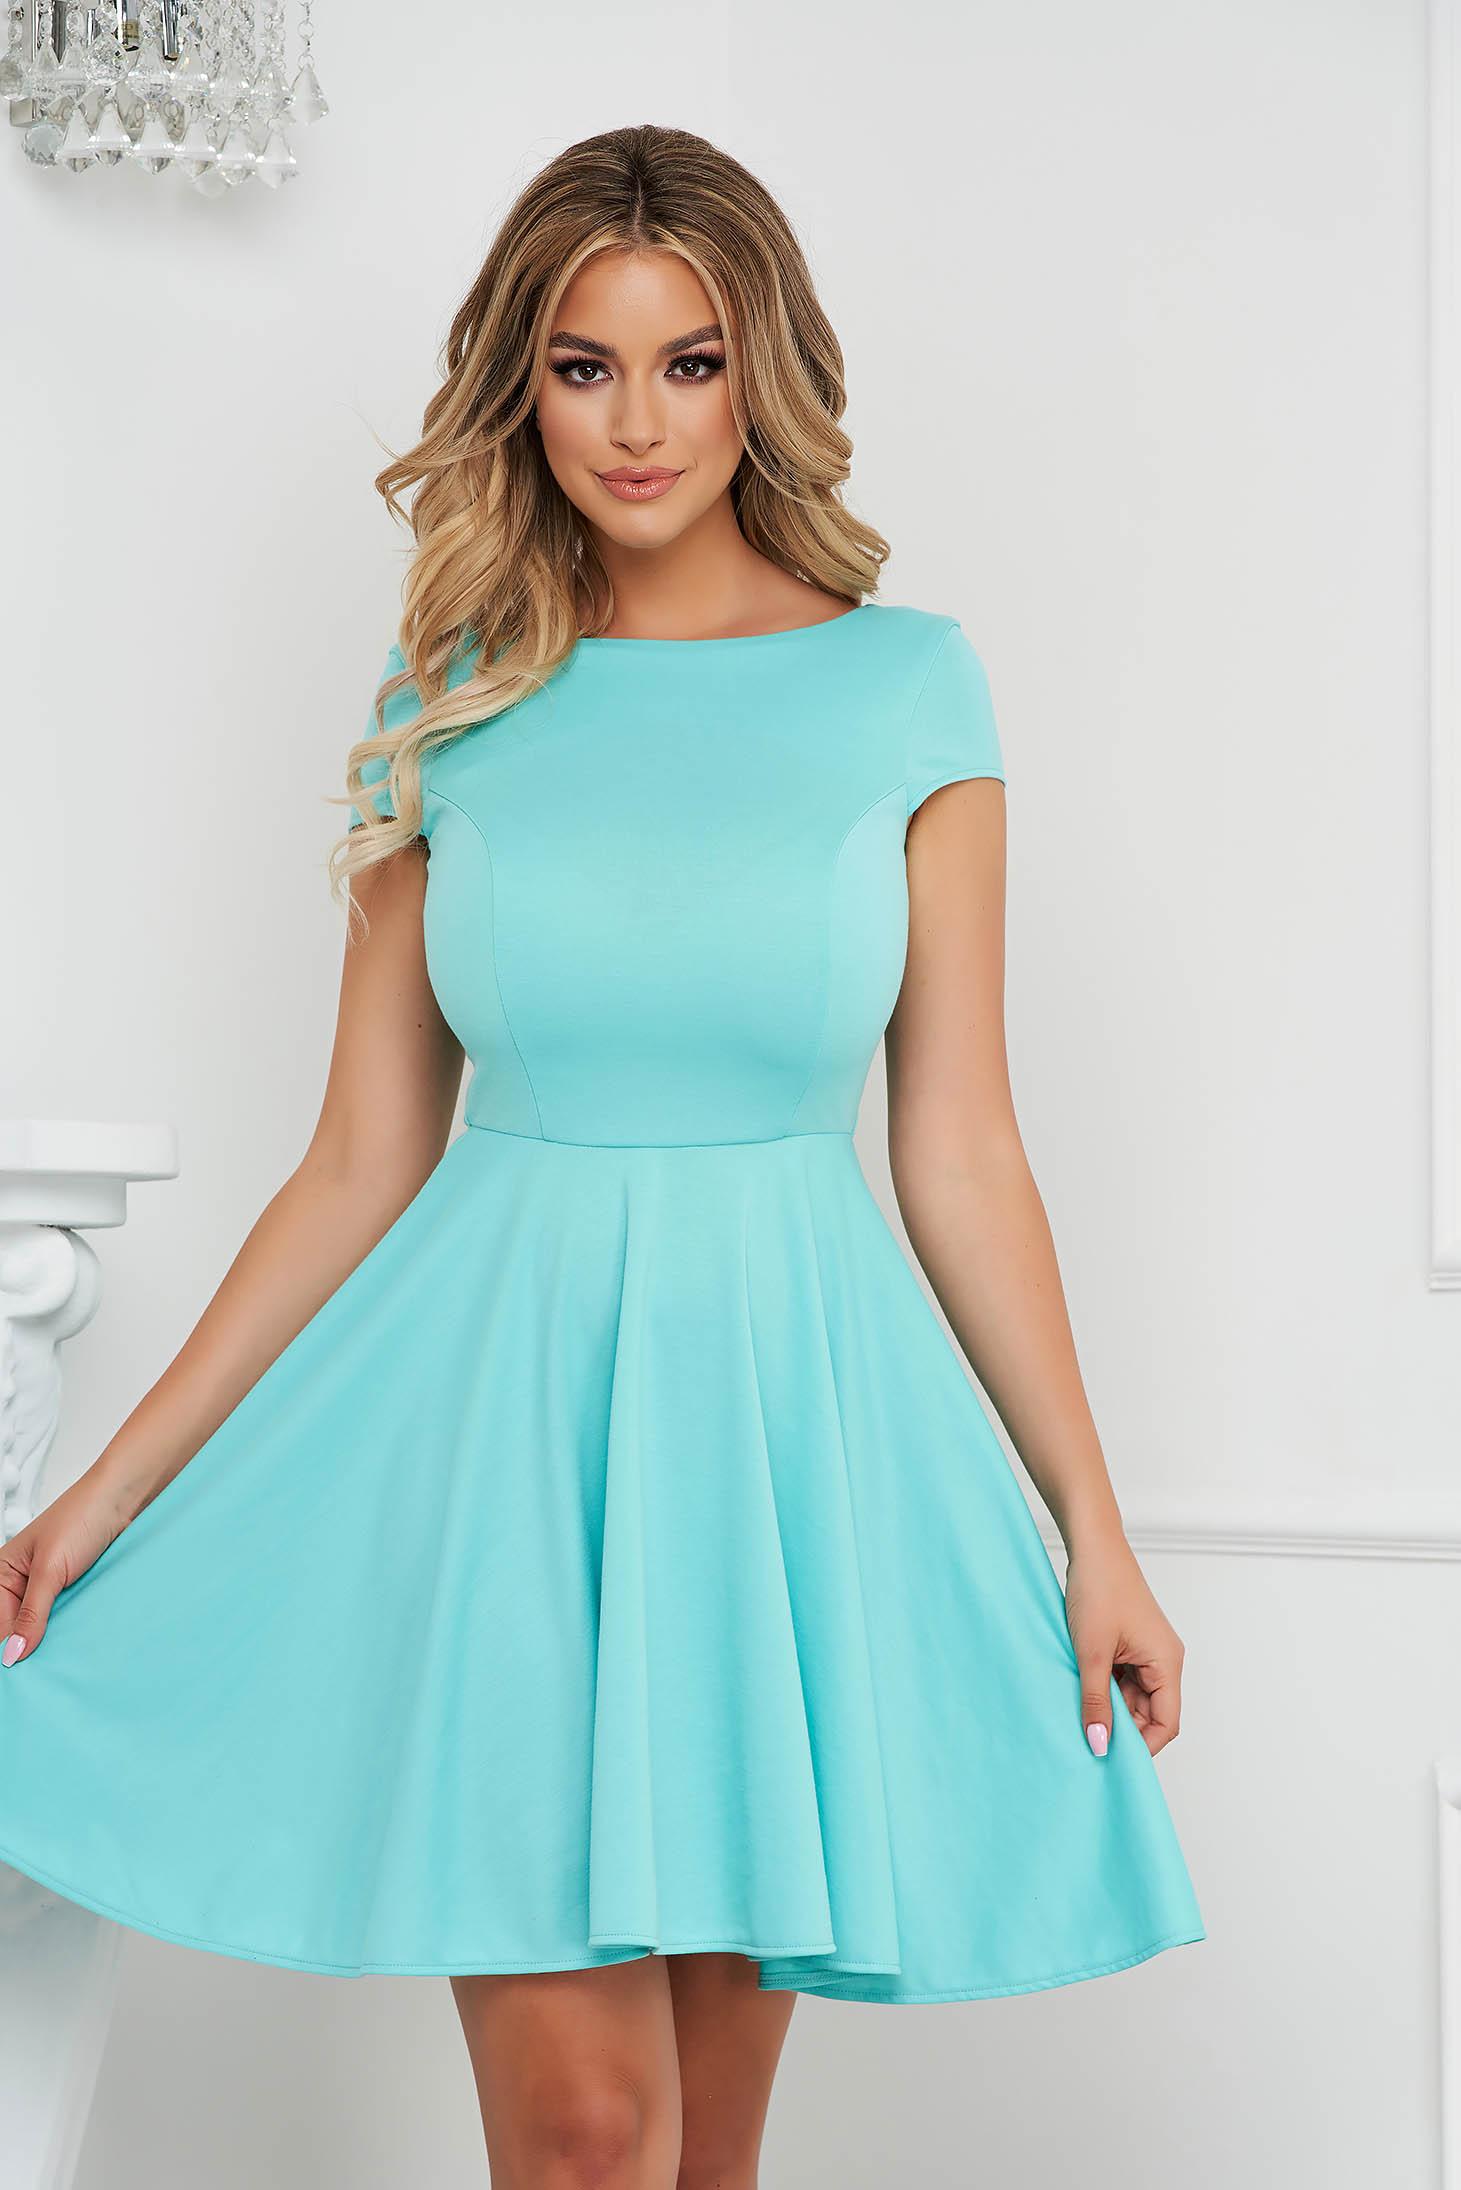 Mint StarShinerS dress cloche slightly elastic fabric v back neckline